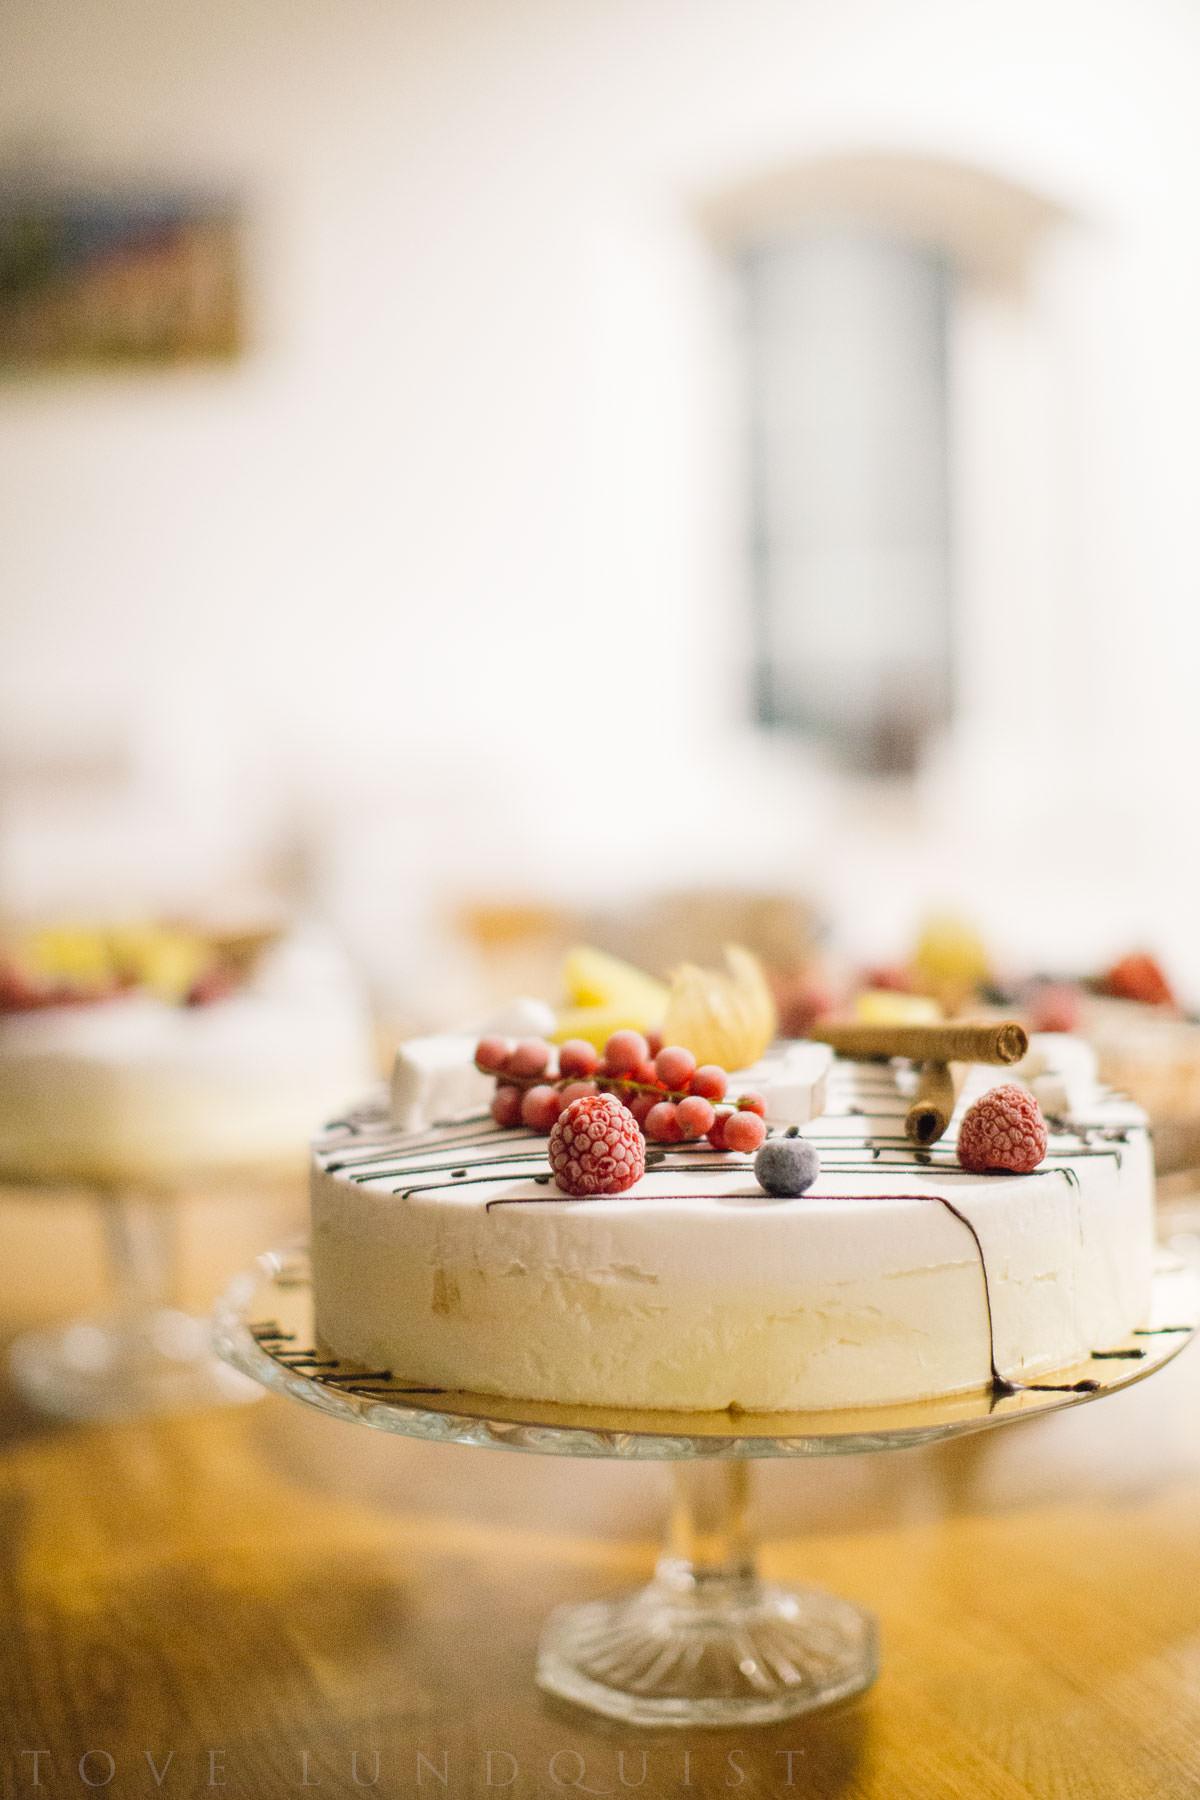 Glasstårta till bröllop från Dolce Sicilia, Malmö. Foto: Tove Lundquist.